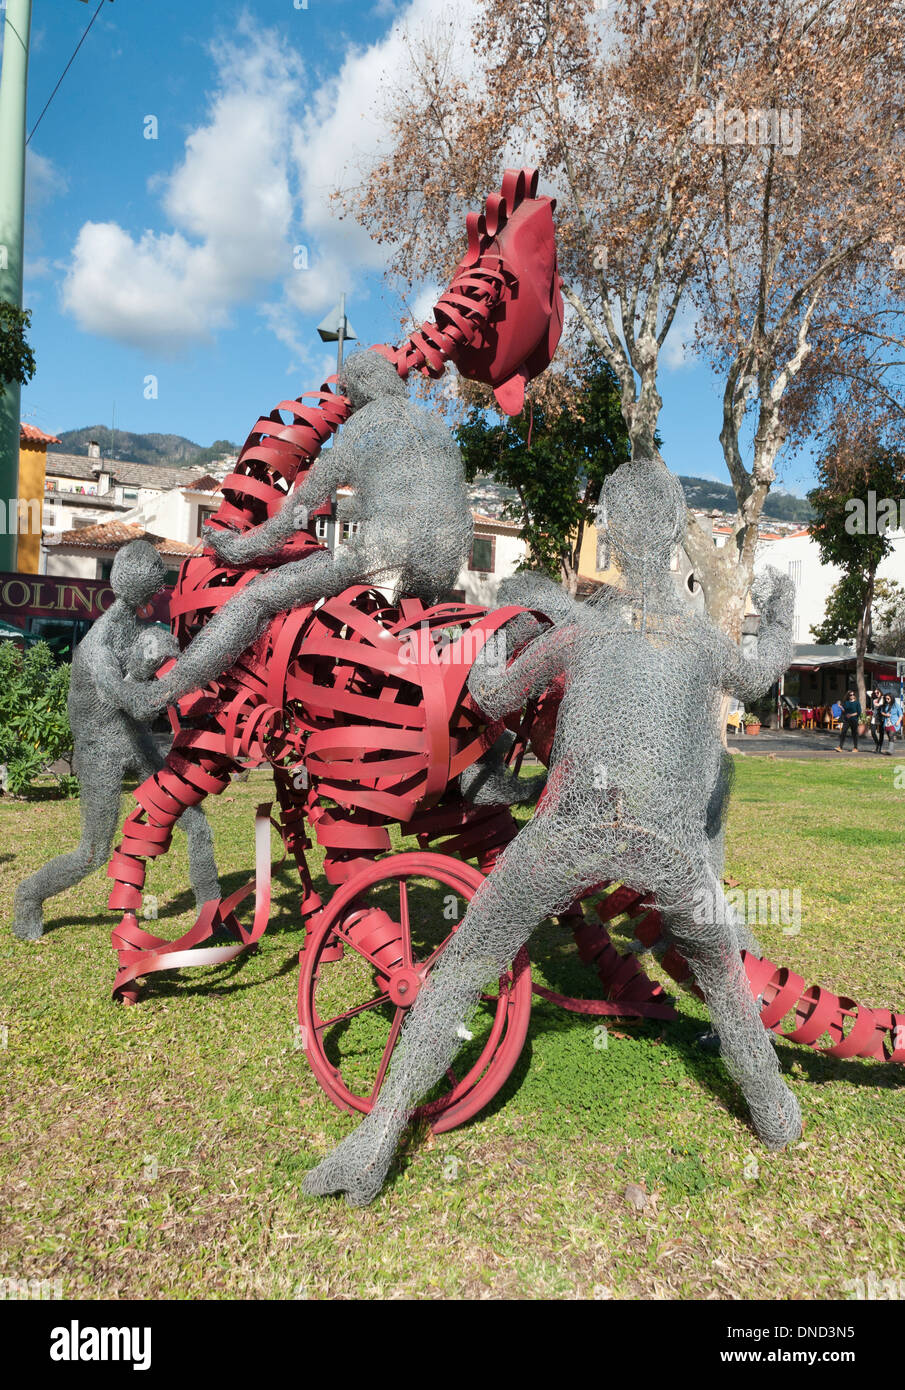 Art works in the Parque Almirante Reis, Funchal - Stock Image